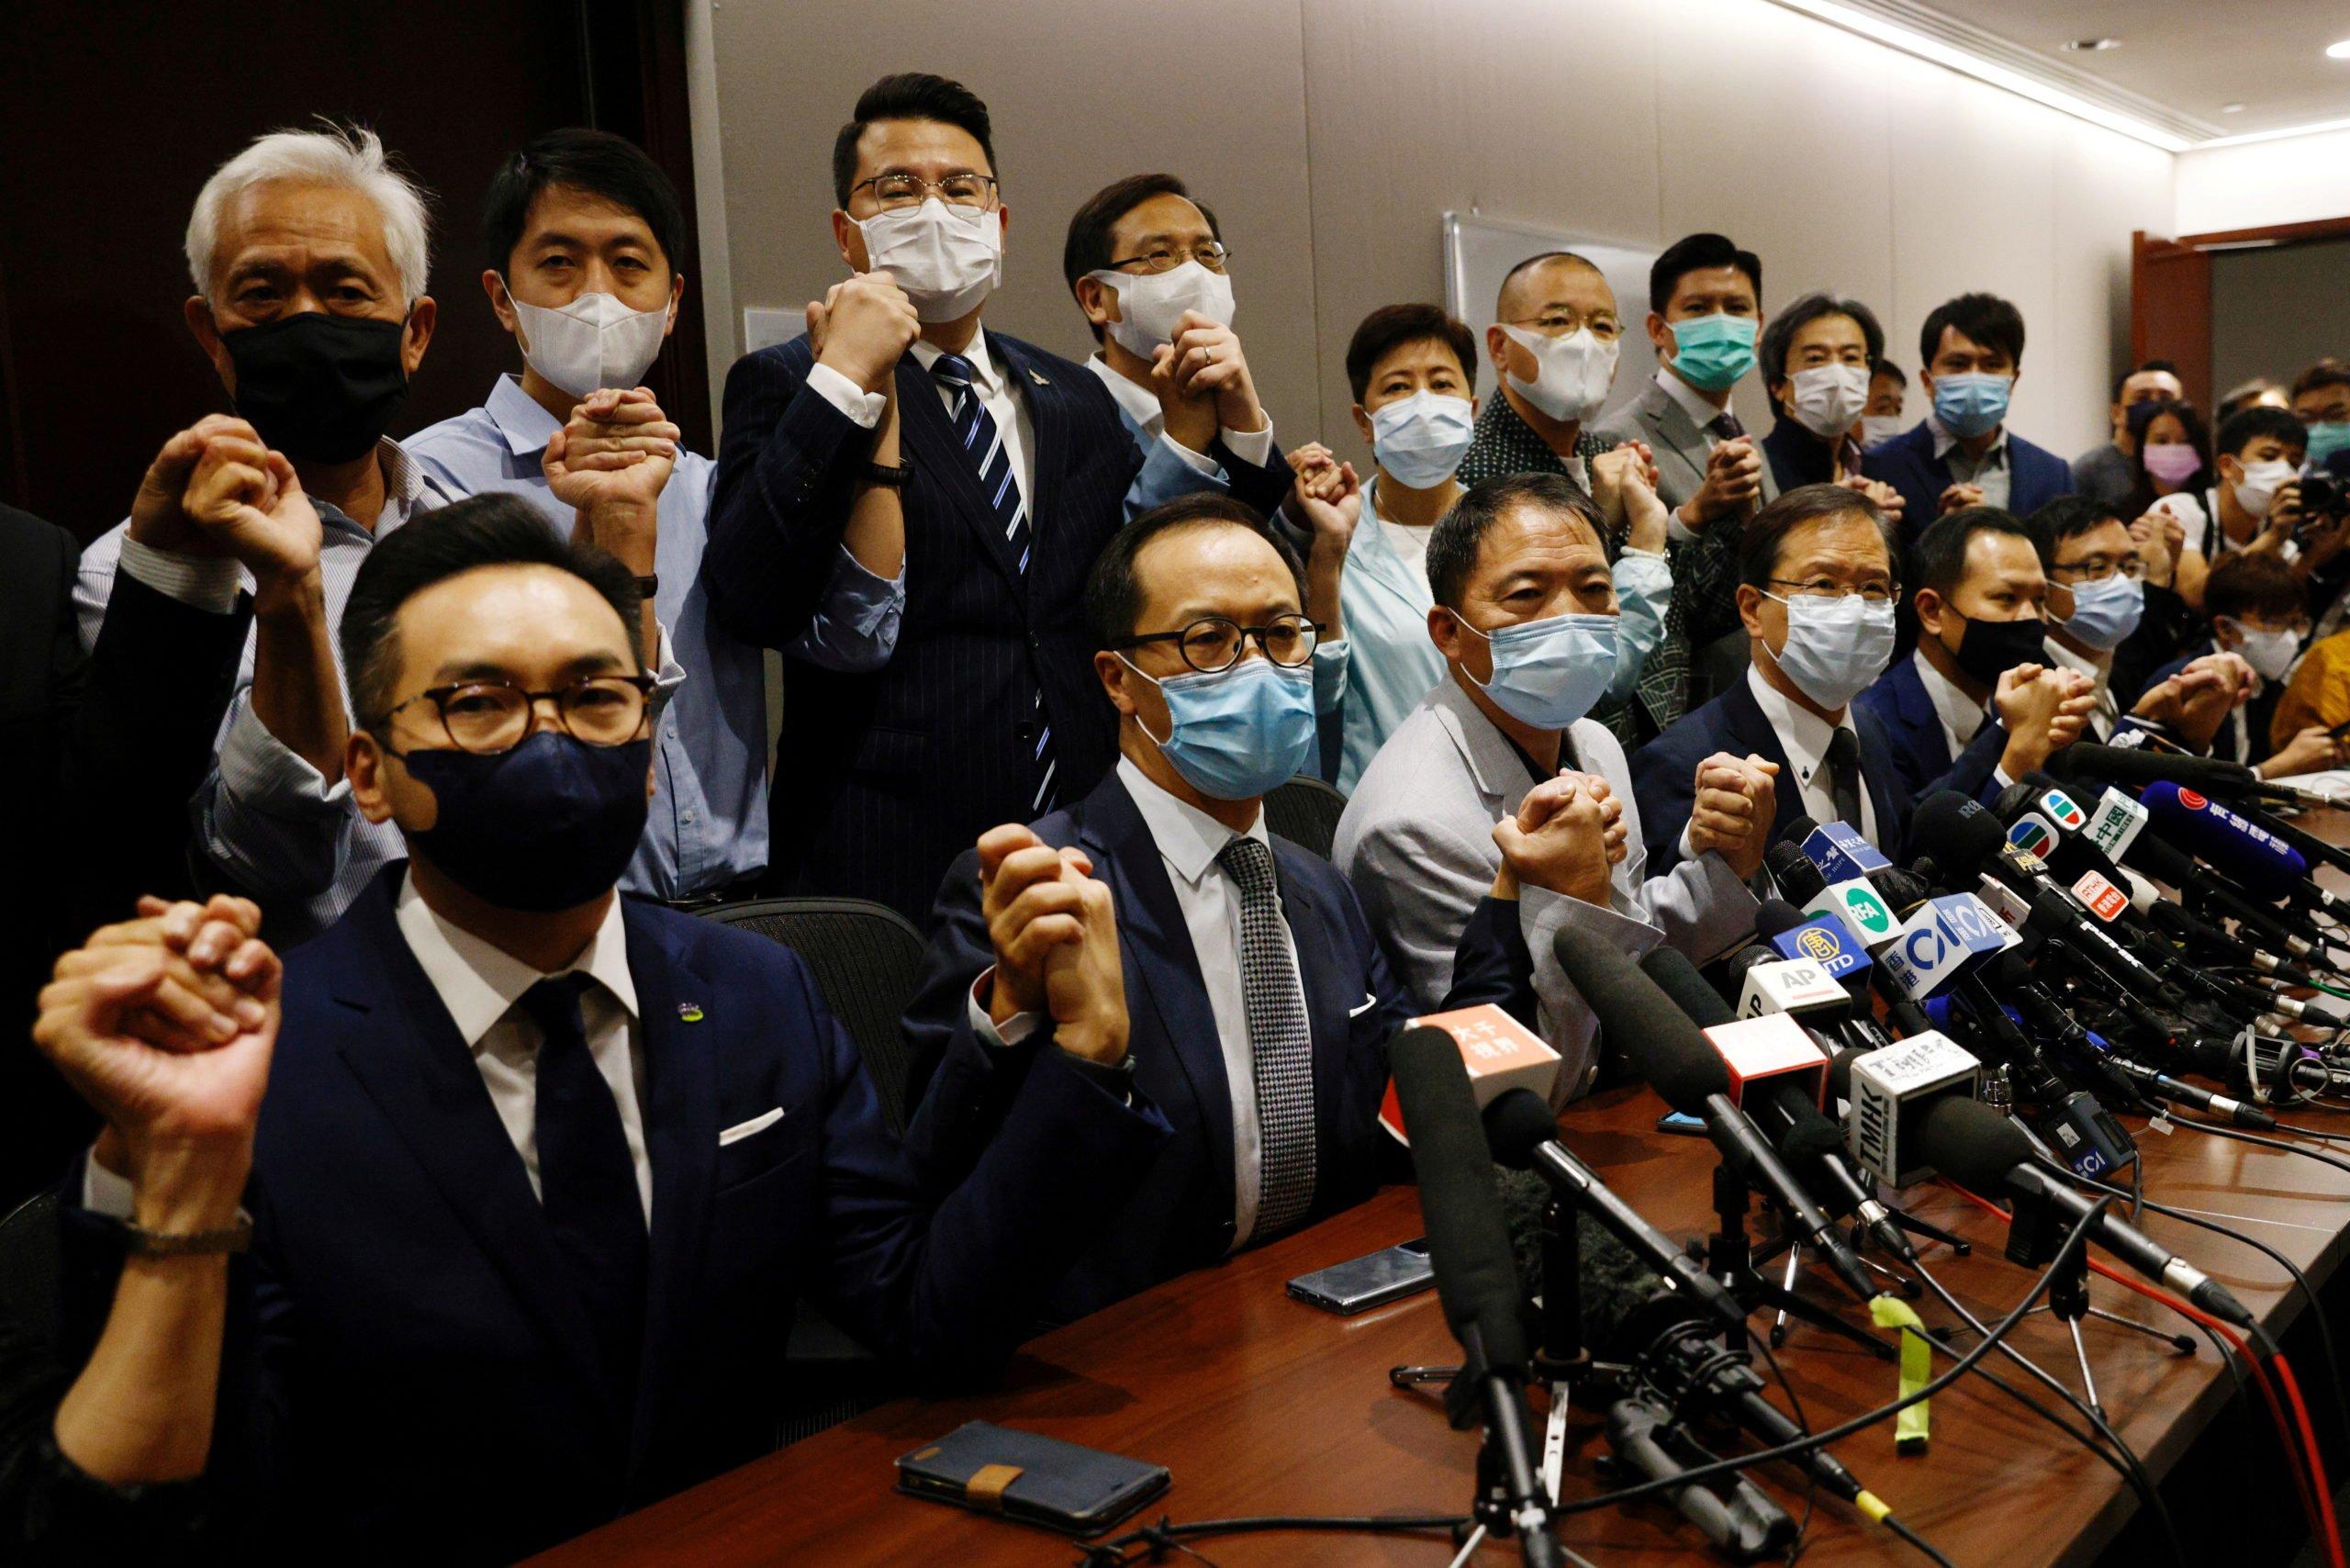 Pan-democratic legislators including Wu Chi-Wai, Claudia Mo and Lam Cheuk-ting announced to resign from the Legislative Council after Alvin Yeung Ngok-kiu, Kwok Ka-ki, Kenneth Leung and Dennis Kwok were disqualified when China passed a new resolution in Hong Kong, China November 11, 2020. REUTERS/Tyrone Siu